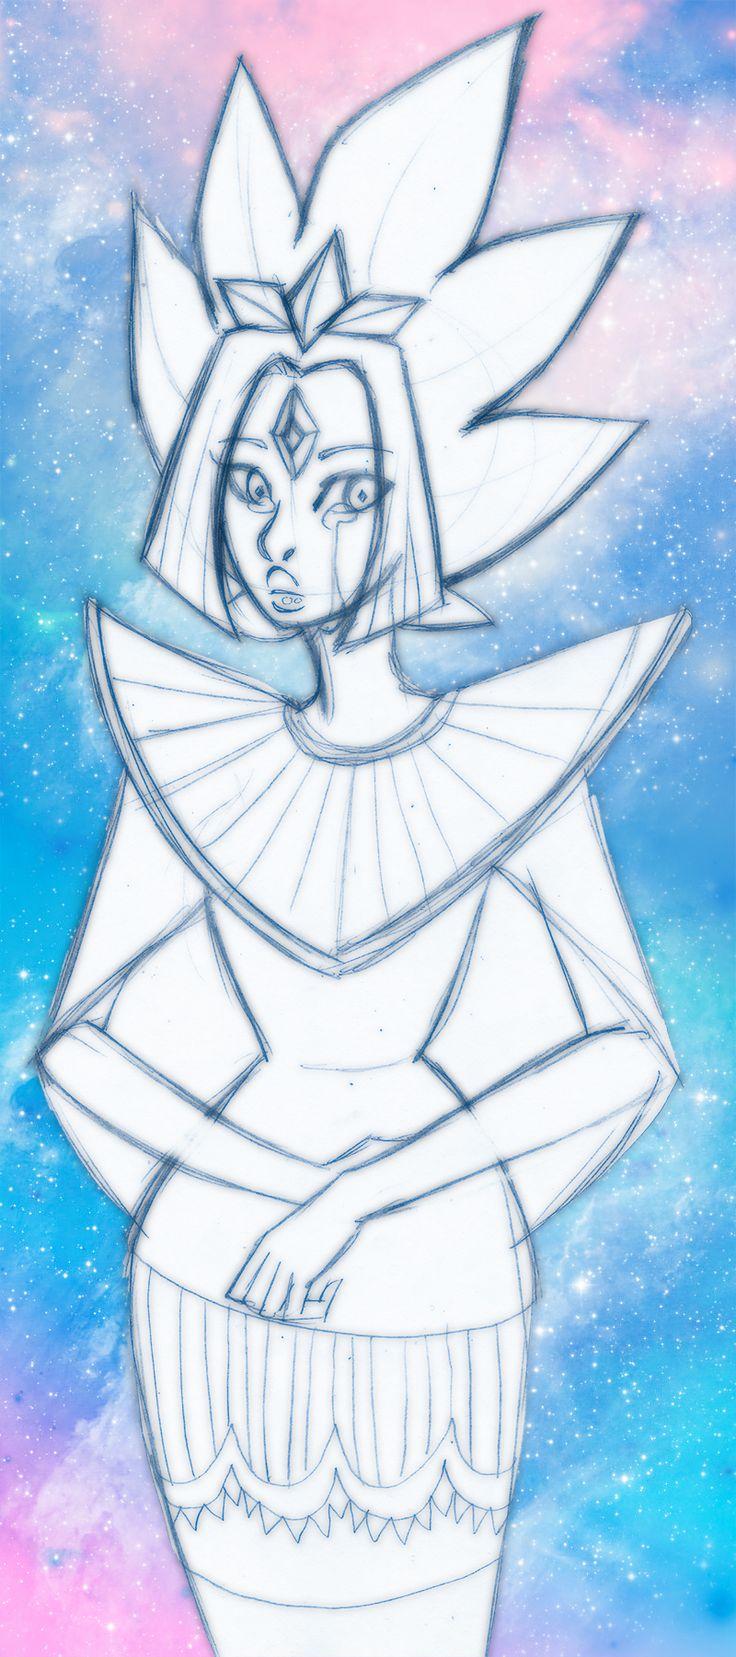 steven_universe___white_diamond___glory_by_gyakuten_no_megami-da3gyea.jpg (800×1802)